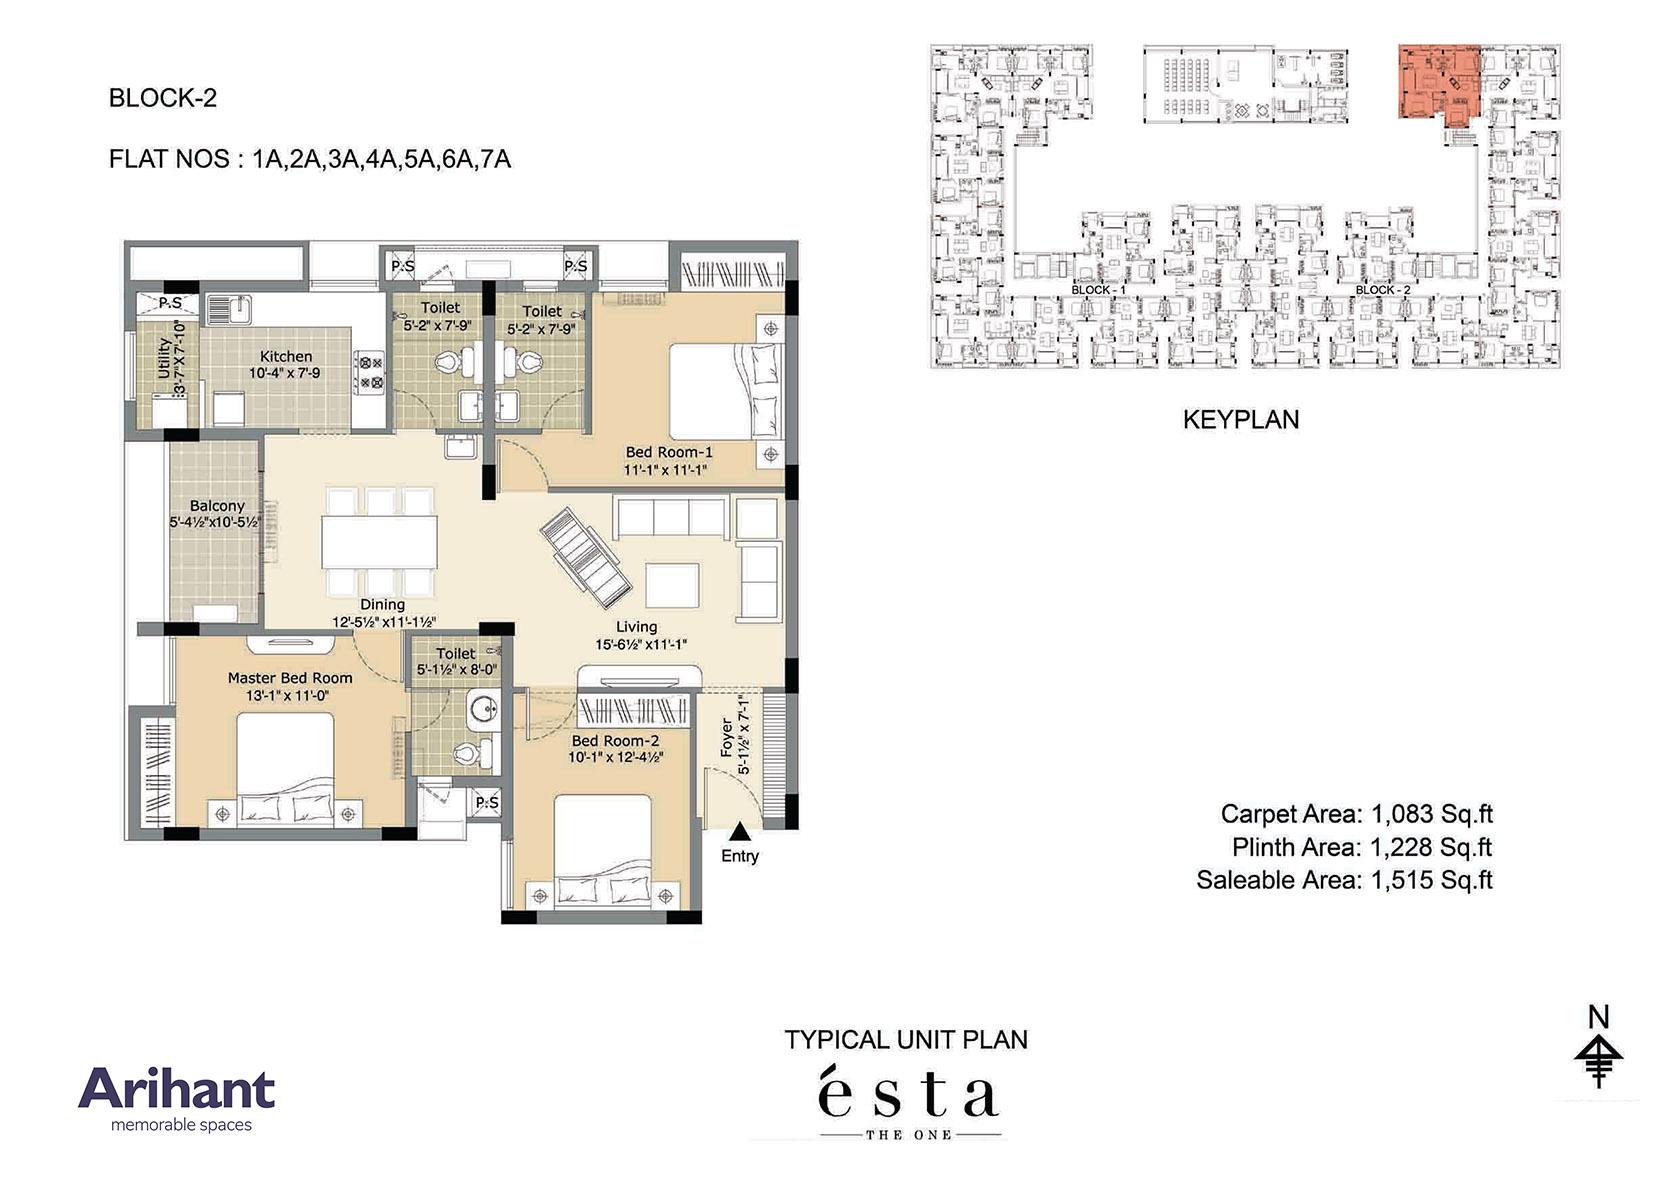 Arihant - Esta_Typical Unit Plan - Block 2 - Type A